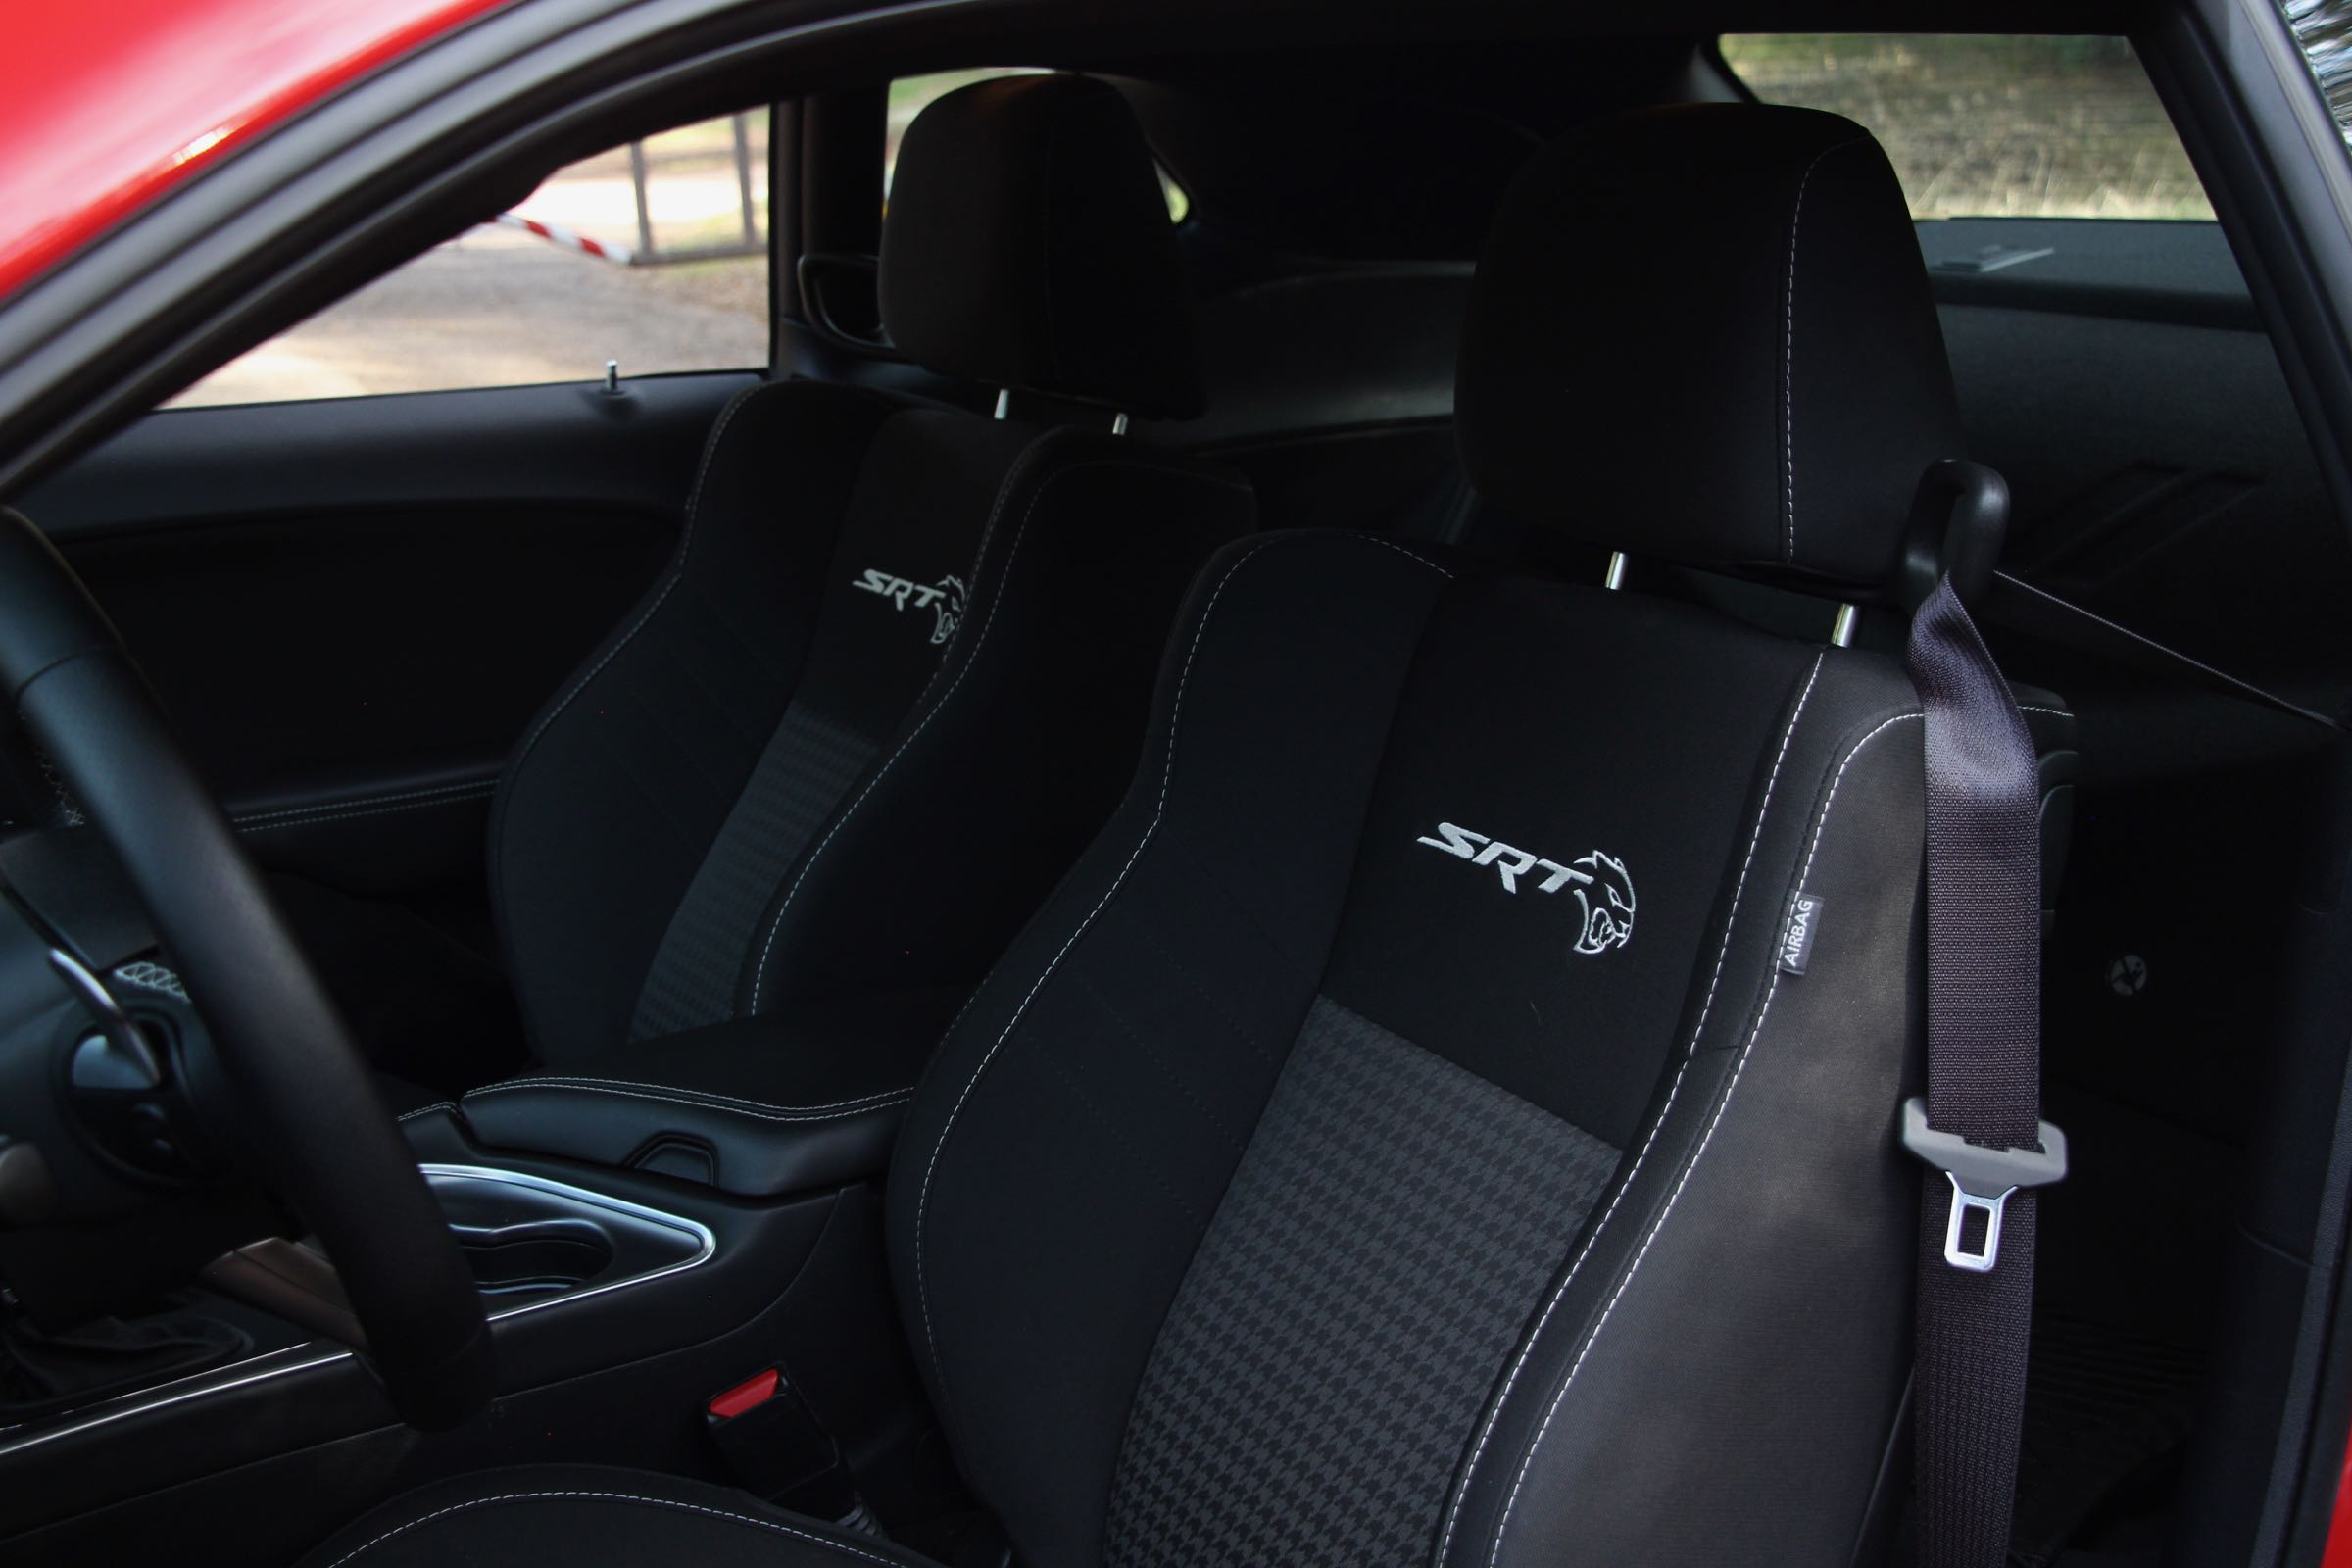 Review 2019 Dodge Challenger SRT Hellcat Redeye